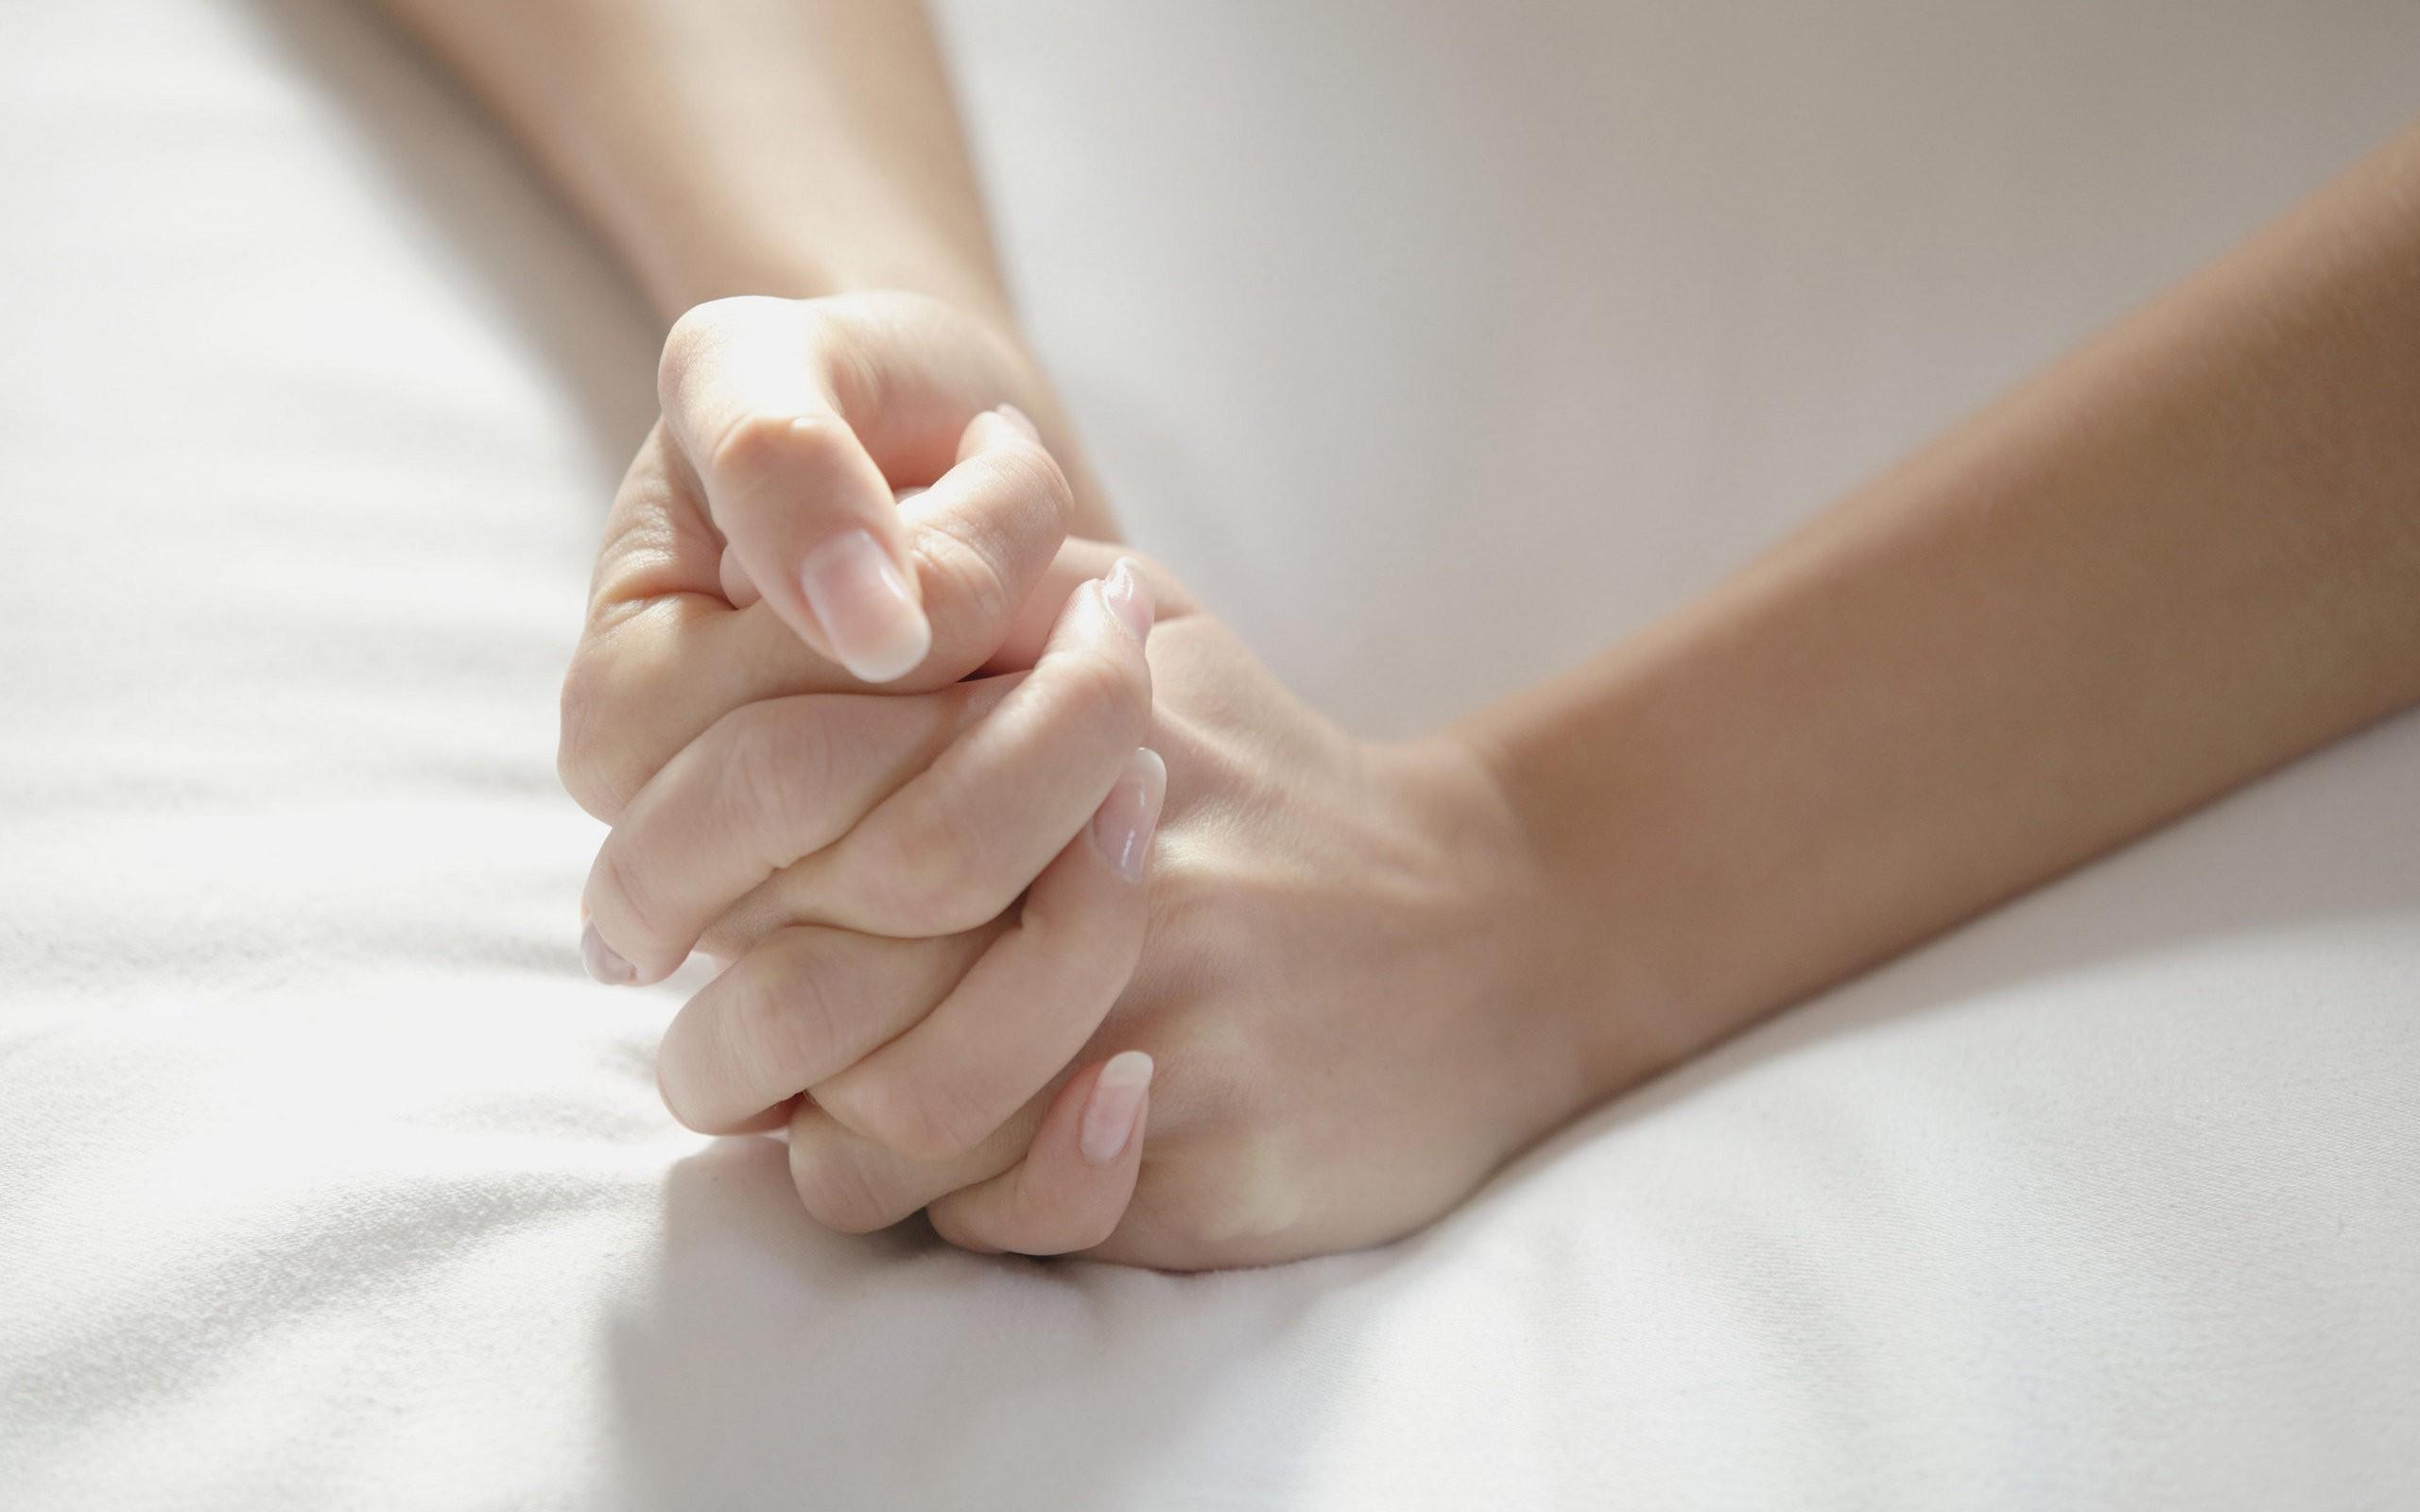 People 2560x1600 hands lesbians holding hands women